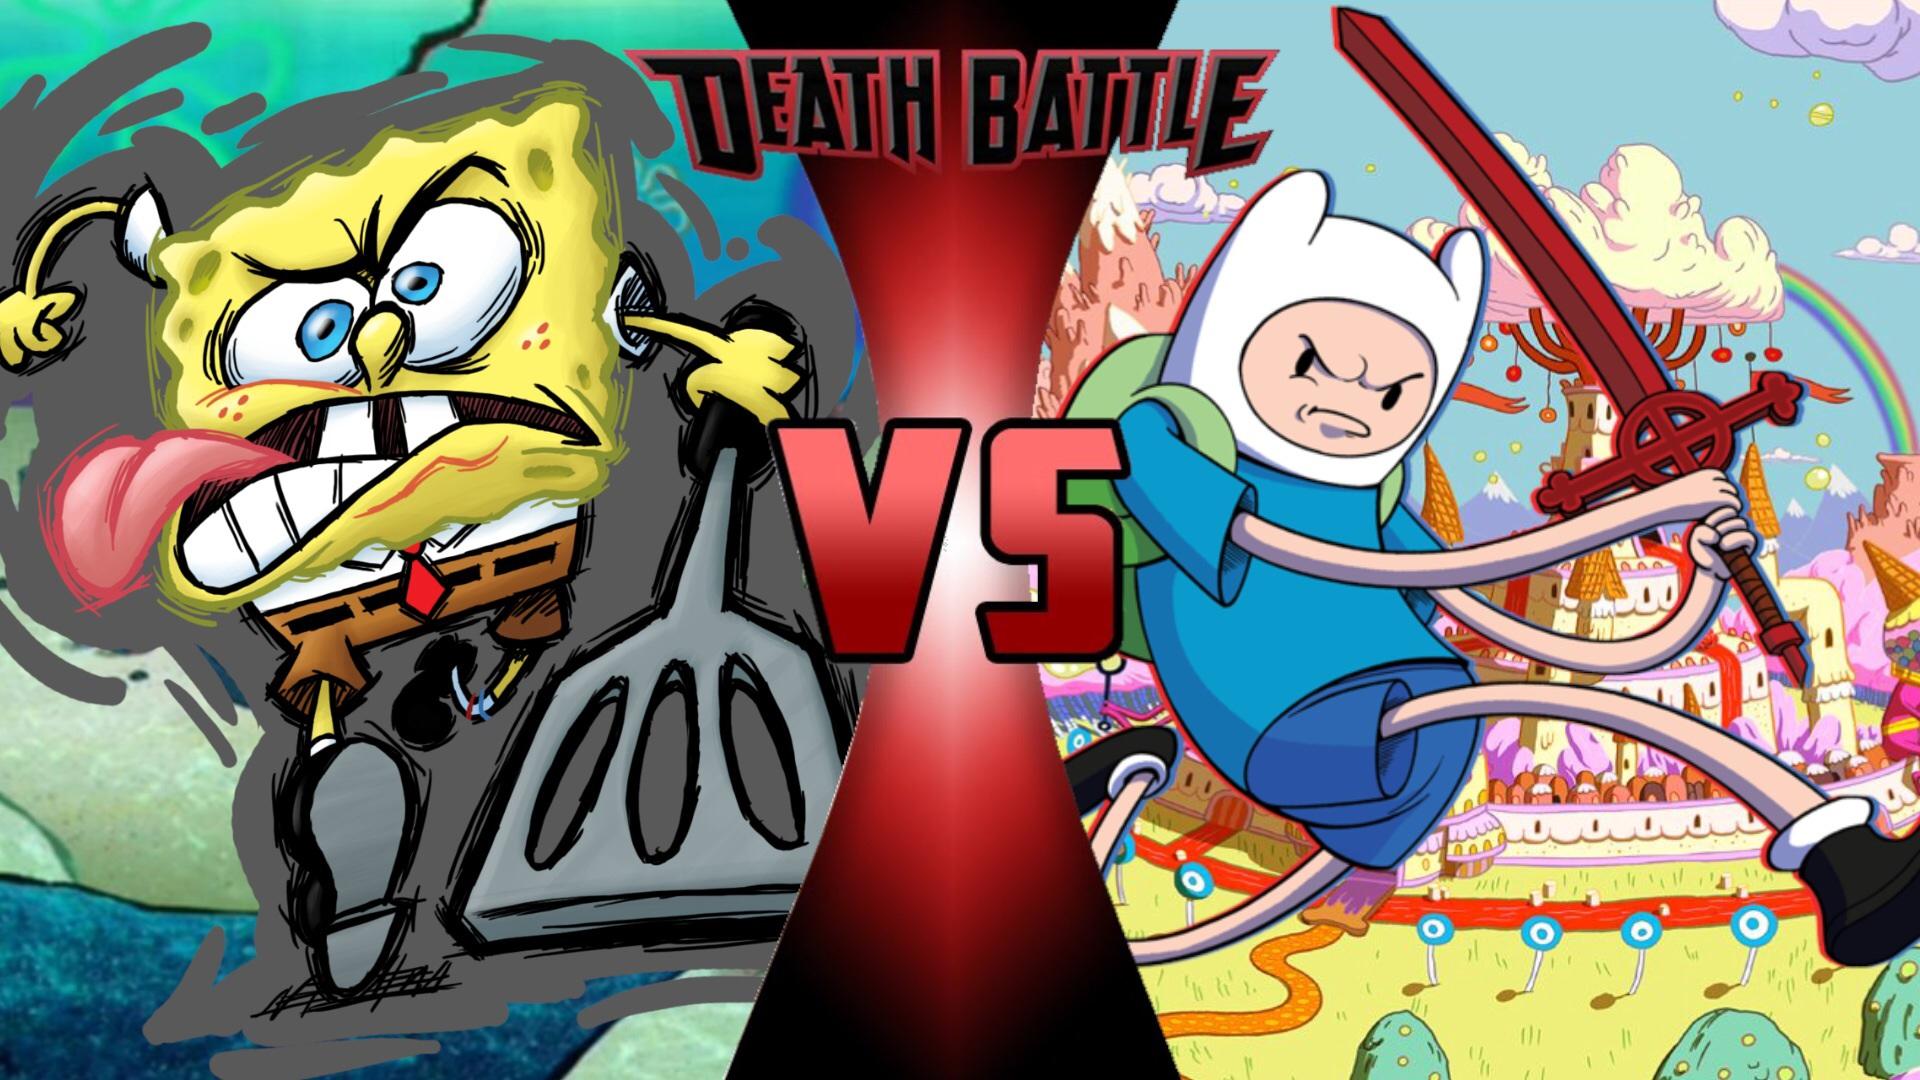 Image spongebob squarepants vs finn the human jpg death battle